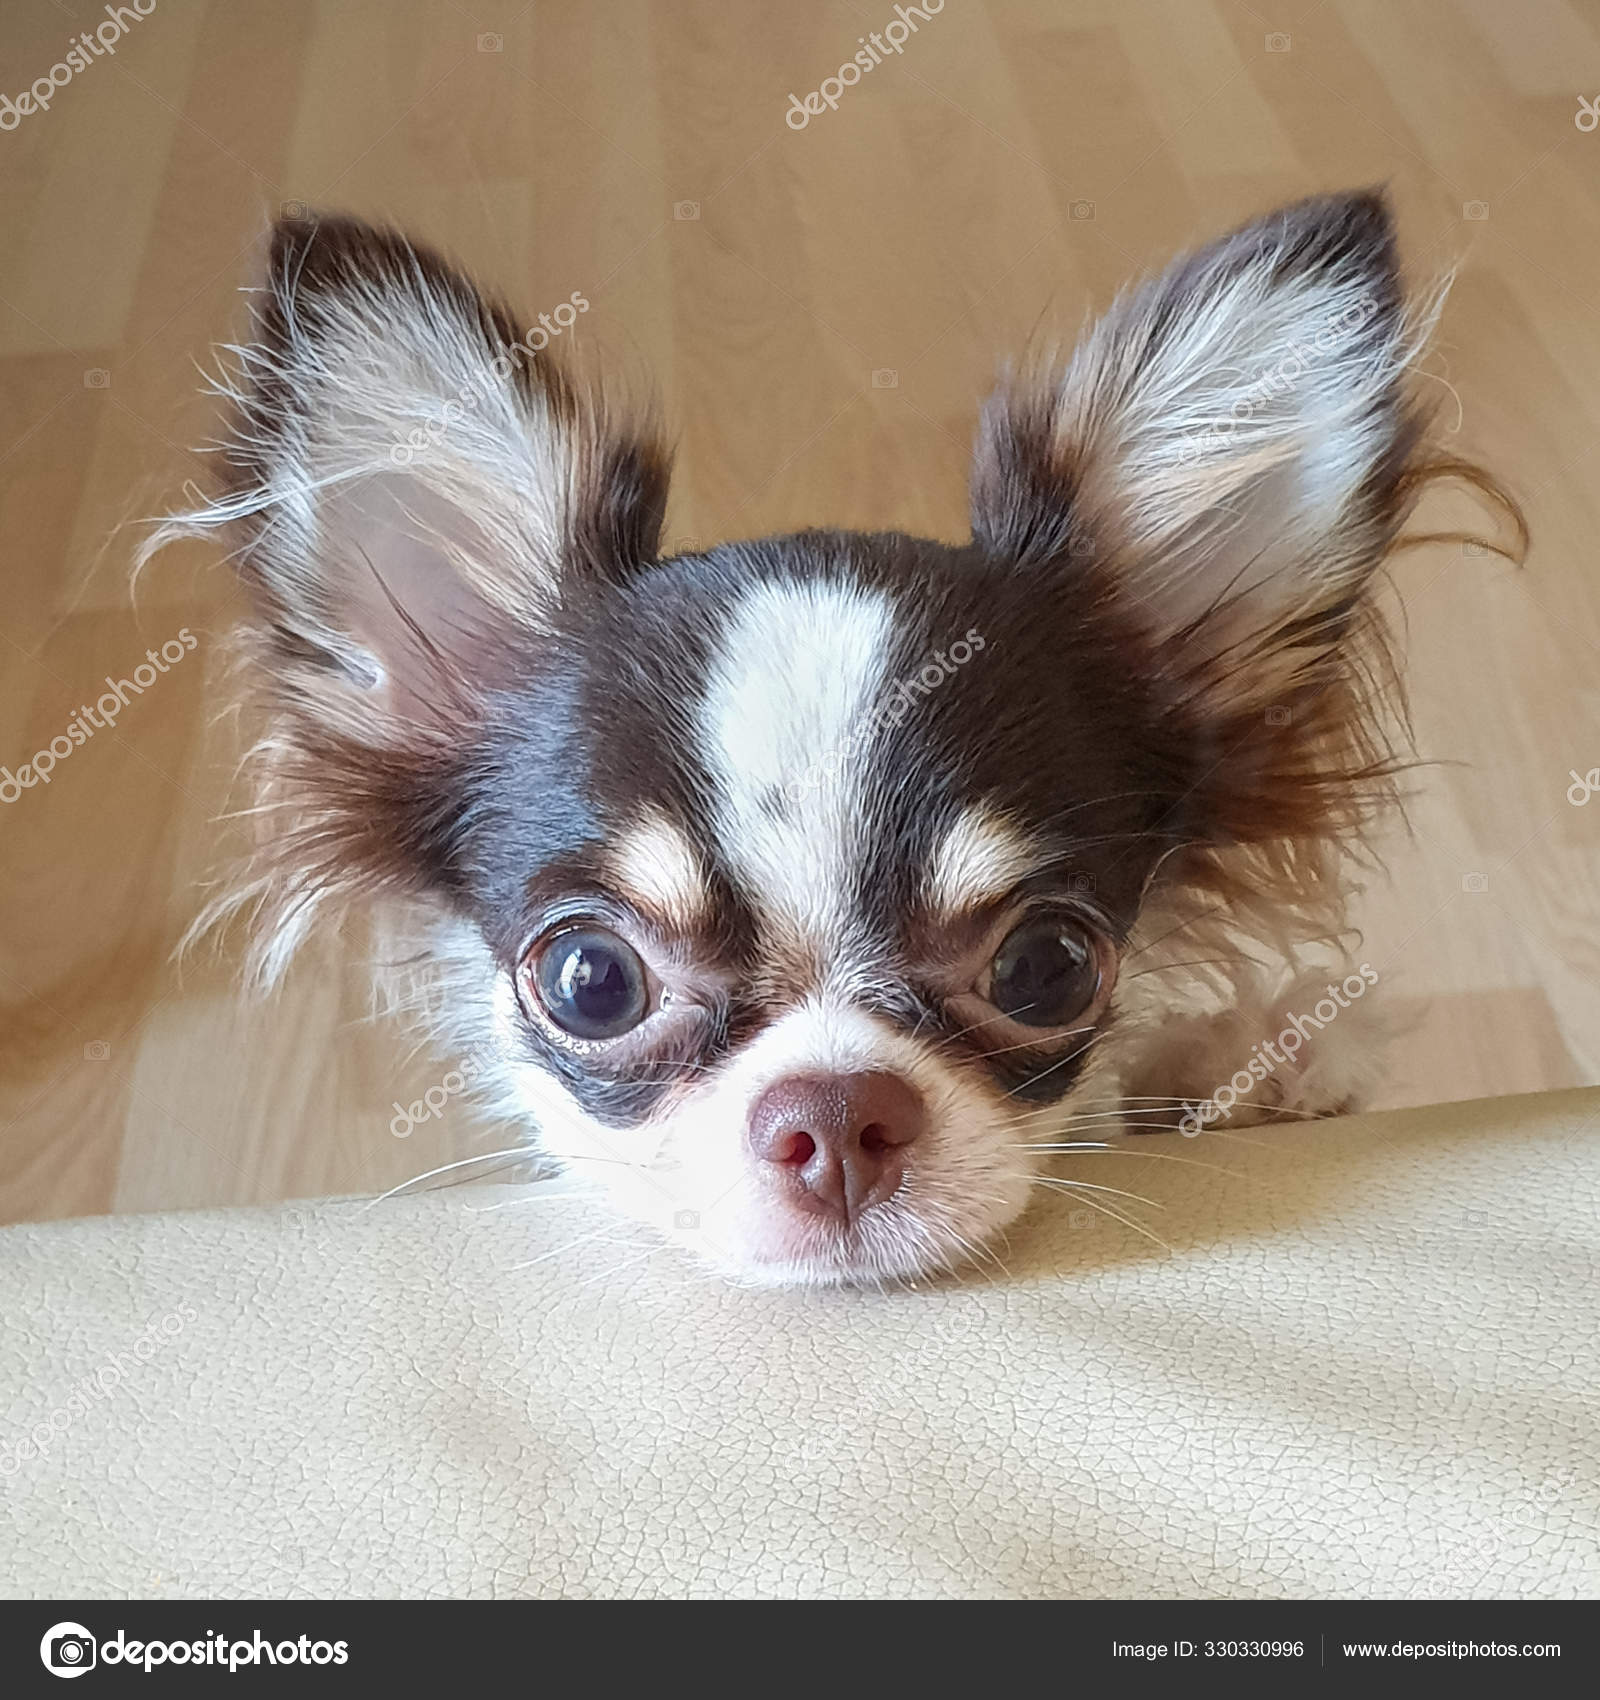 Cute Long Hair Chihuahua Puppy Facing The Camera Stock Photo C Suphawinee B Gmail Com 330330996